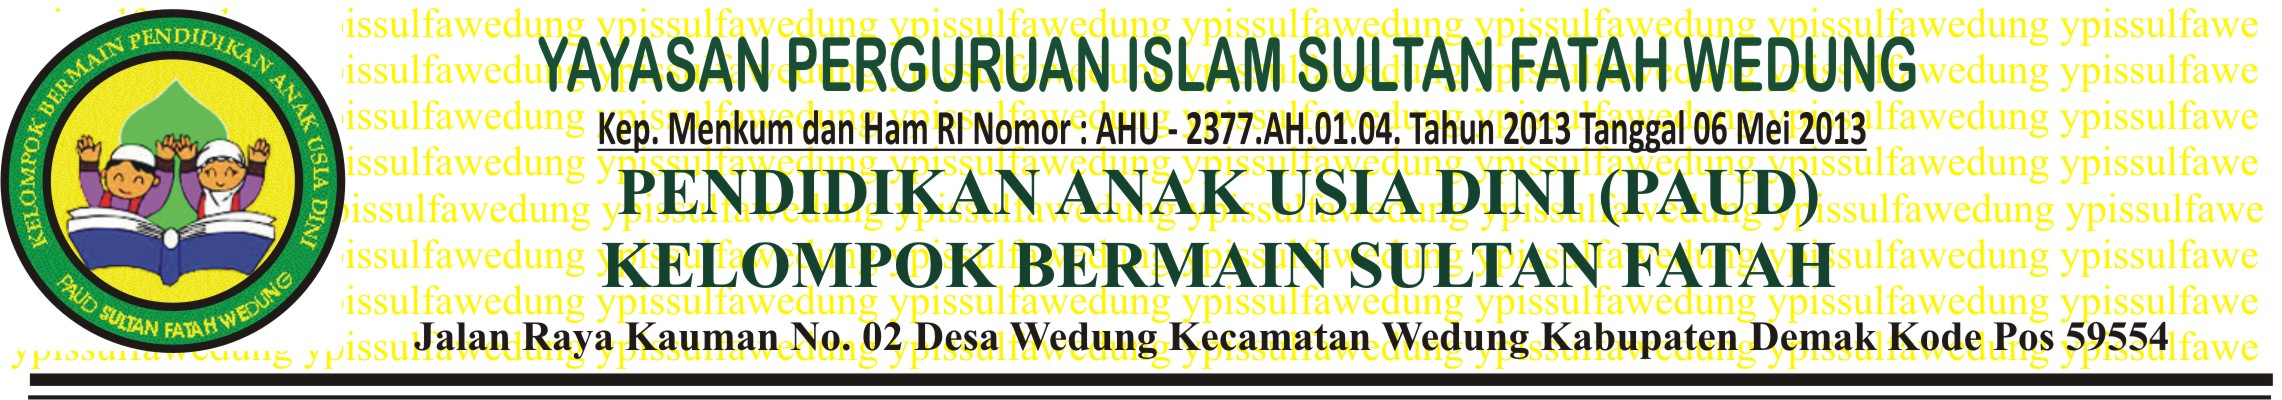 Kop Surat Paud Perguruan Islam Sultan Fatah Wedung